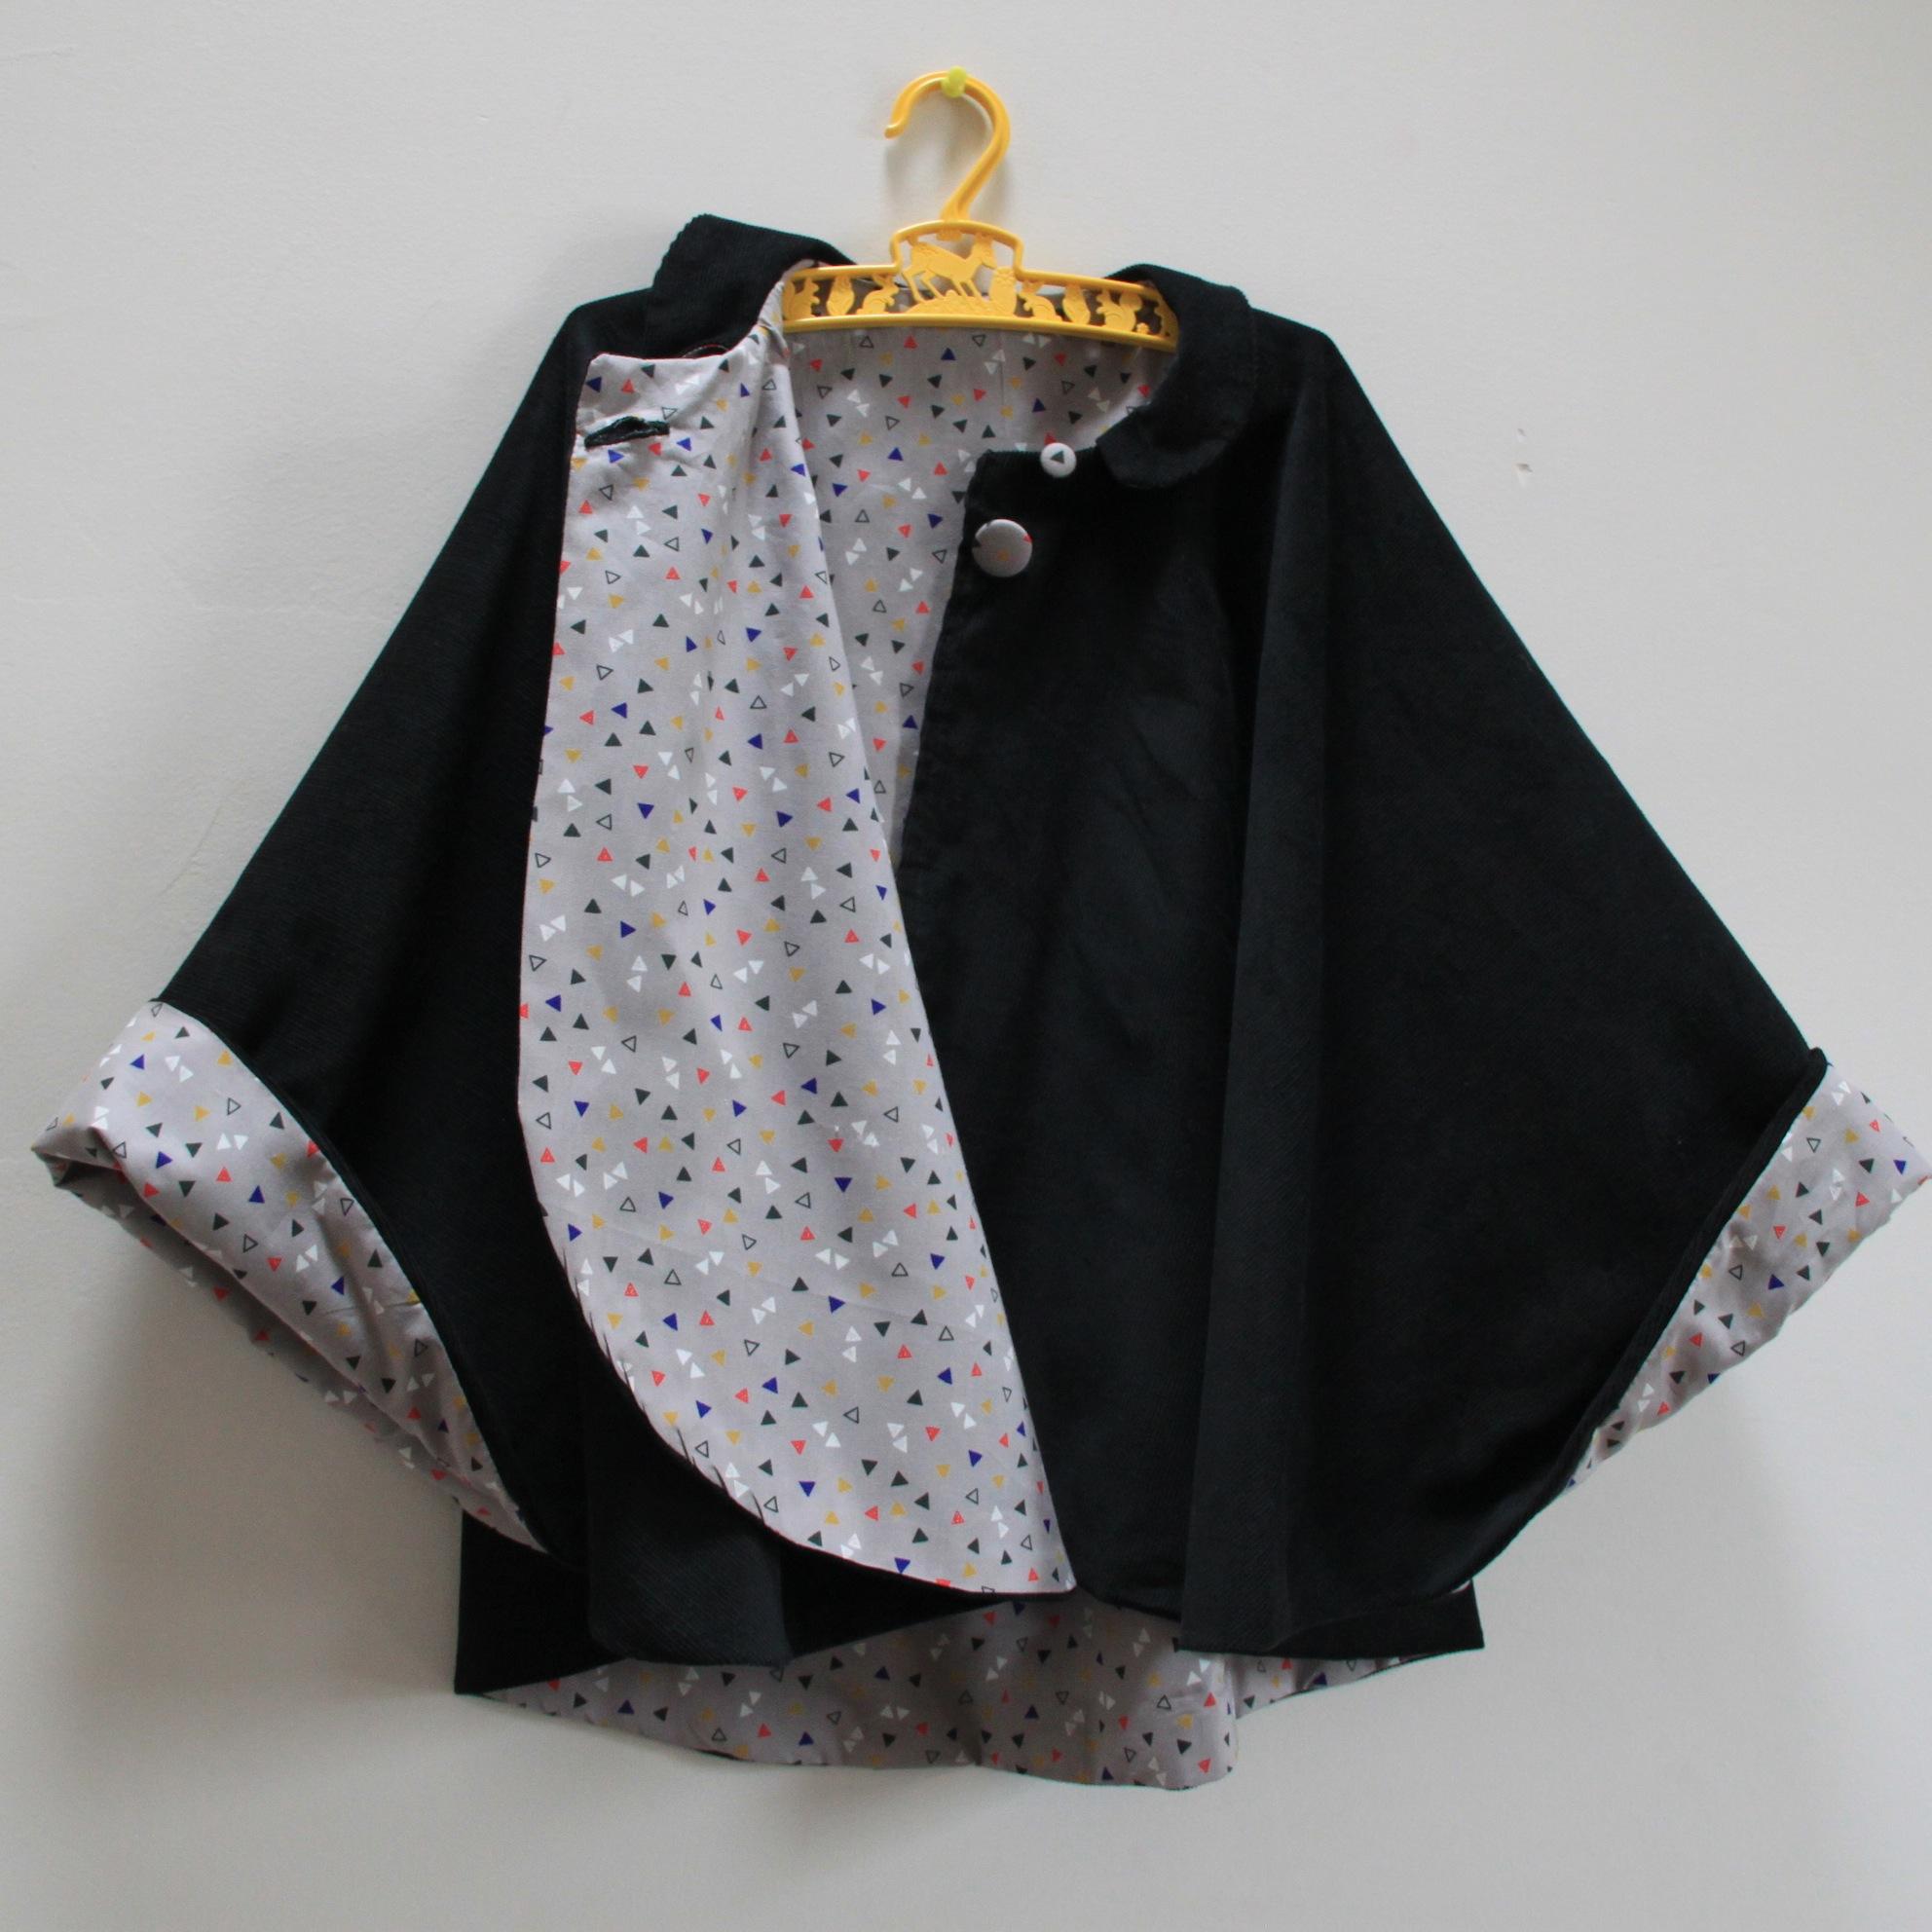 1 000 couture facile pinterest cousu main tuto burda couture facile. Black Bedroom Furniture Sets. Home Design Ideas